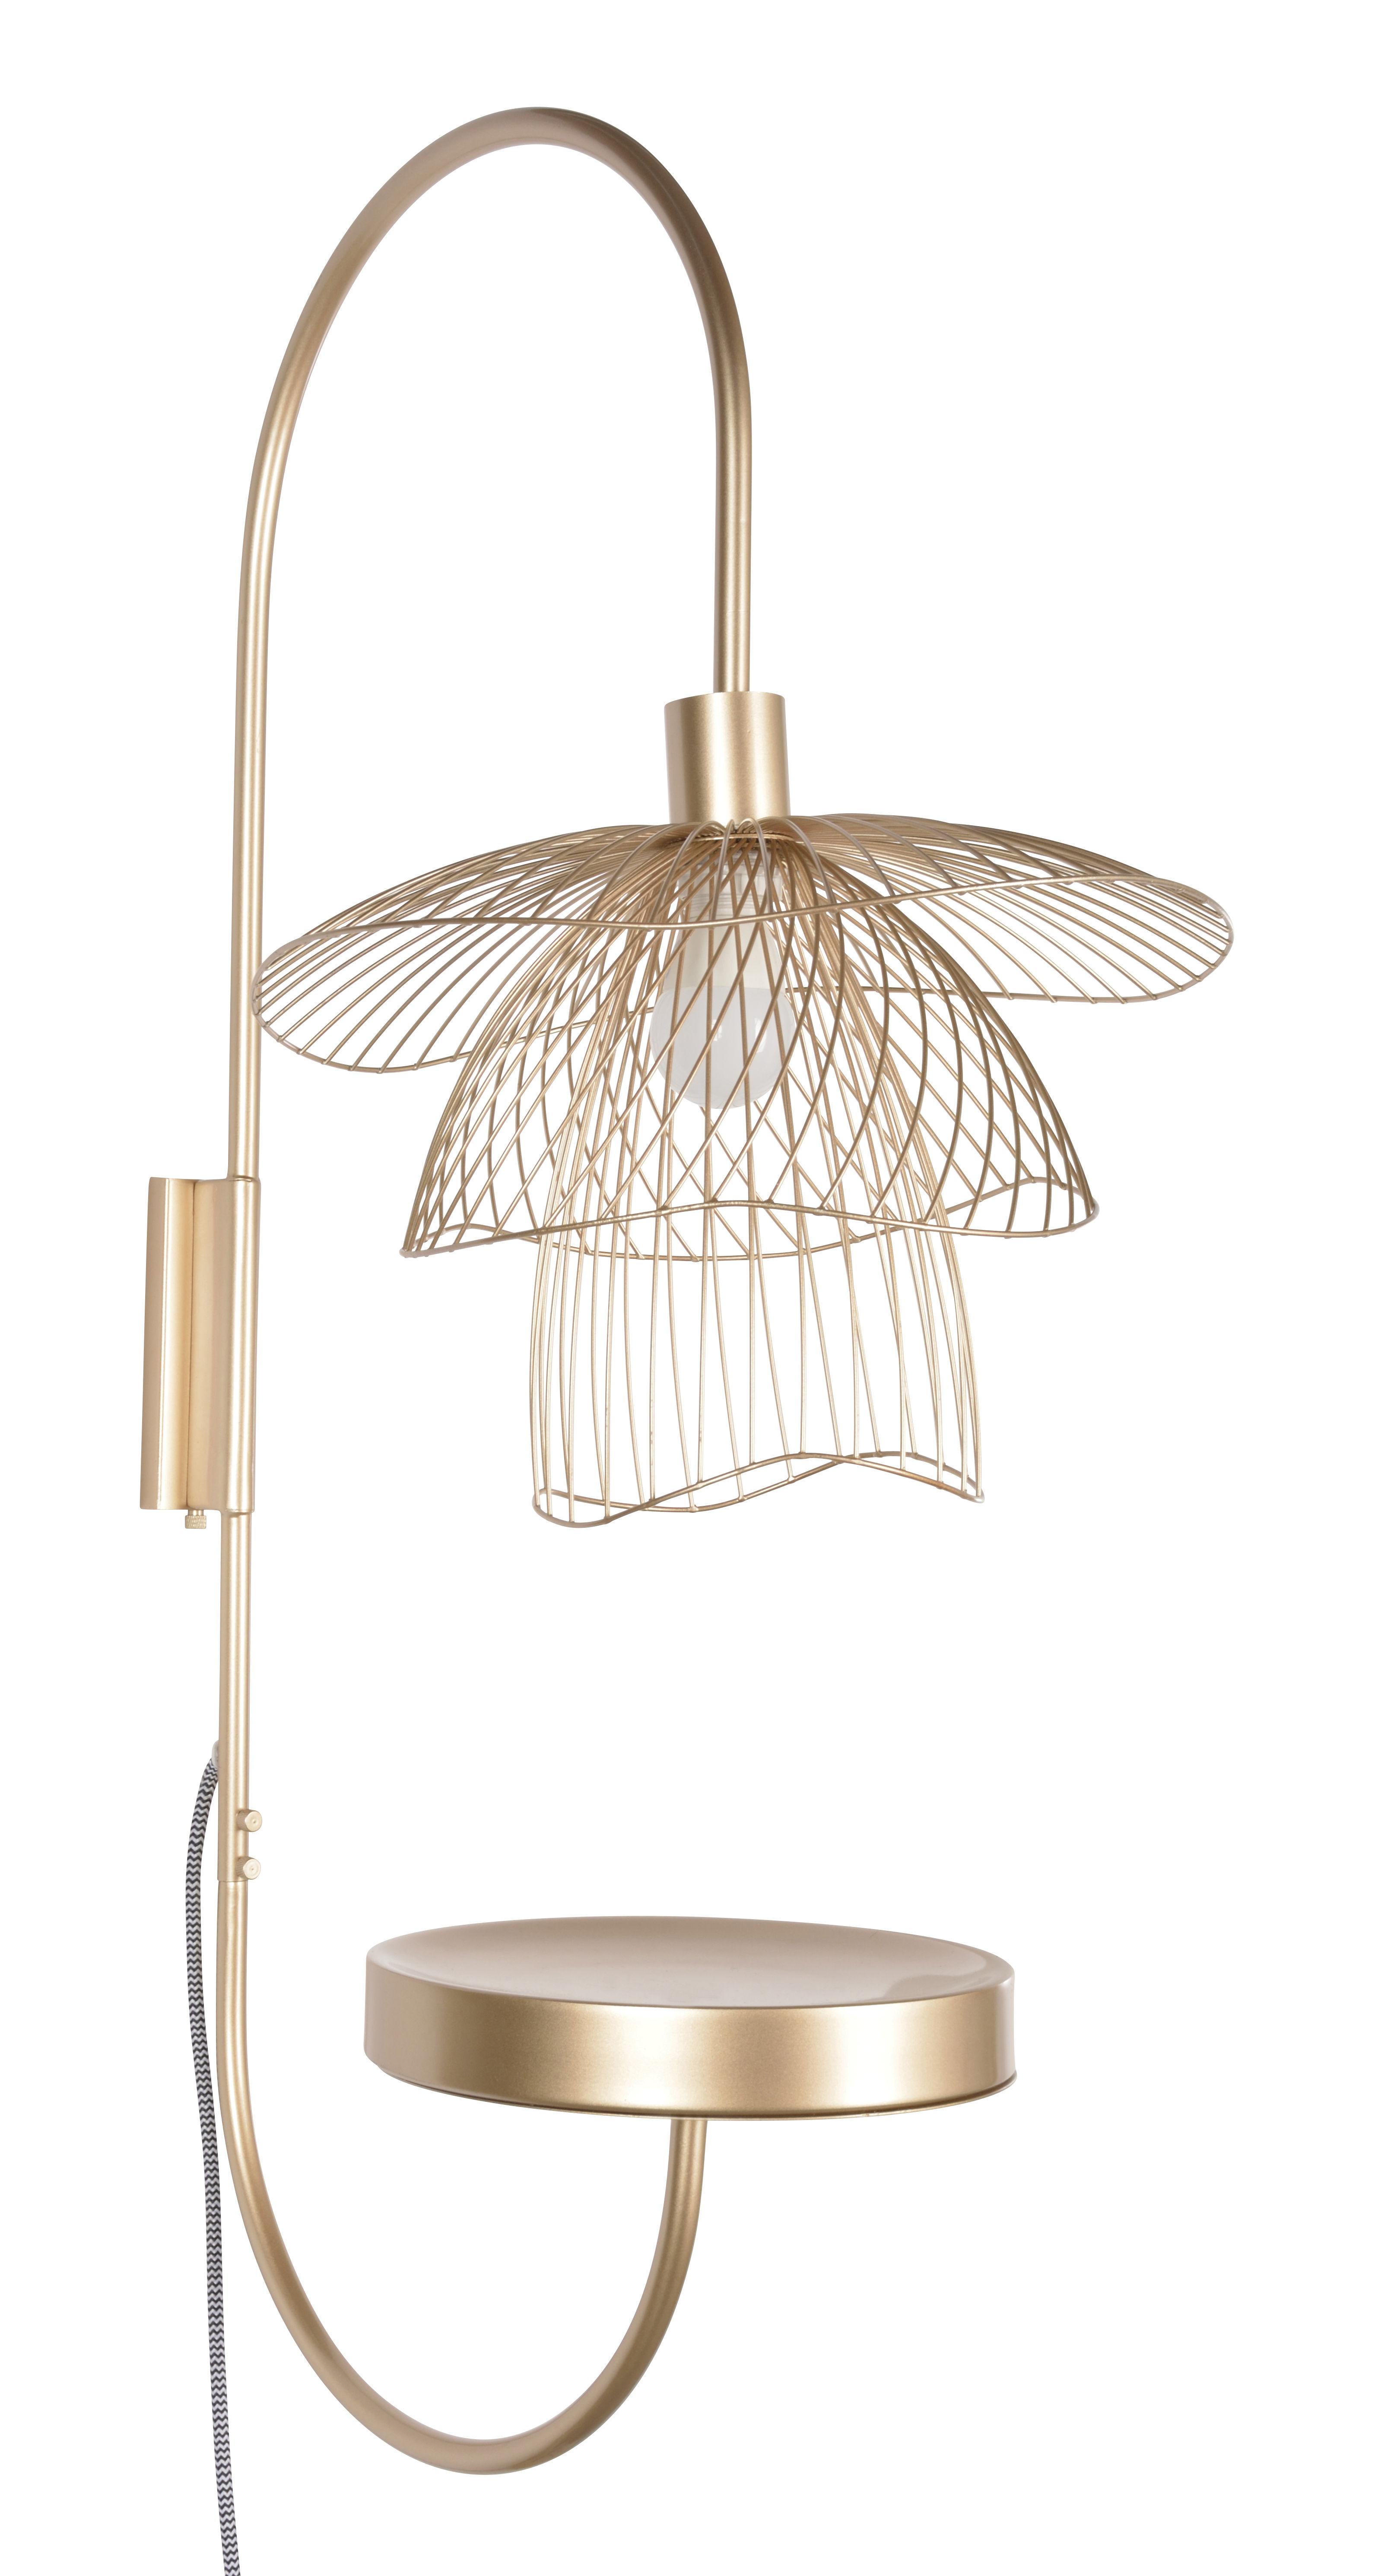 applique avec prise papillon forestier champagne l 200 x h 75 x 30 made in design. Black Bedroom Furniture Sets. Home Design Ideas